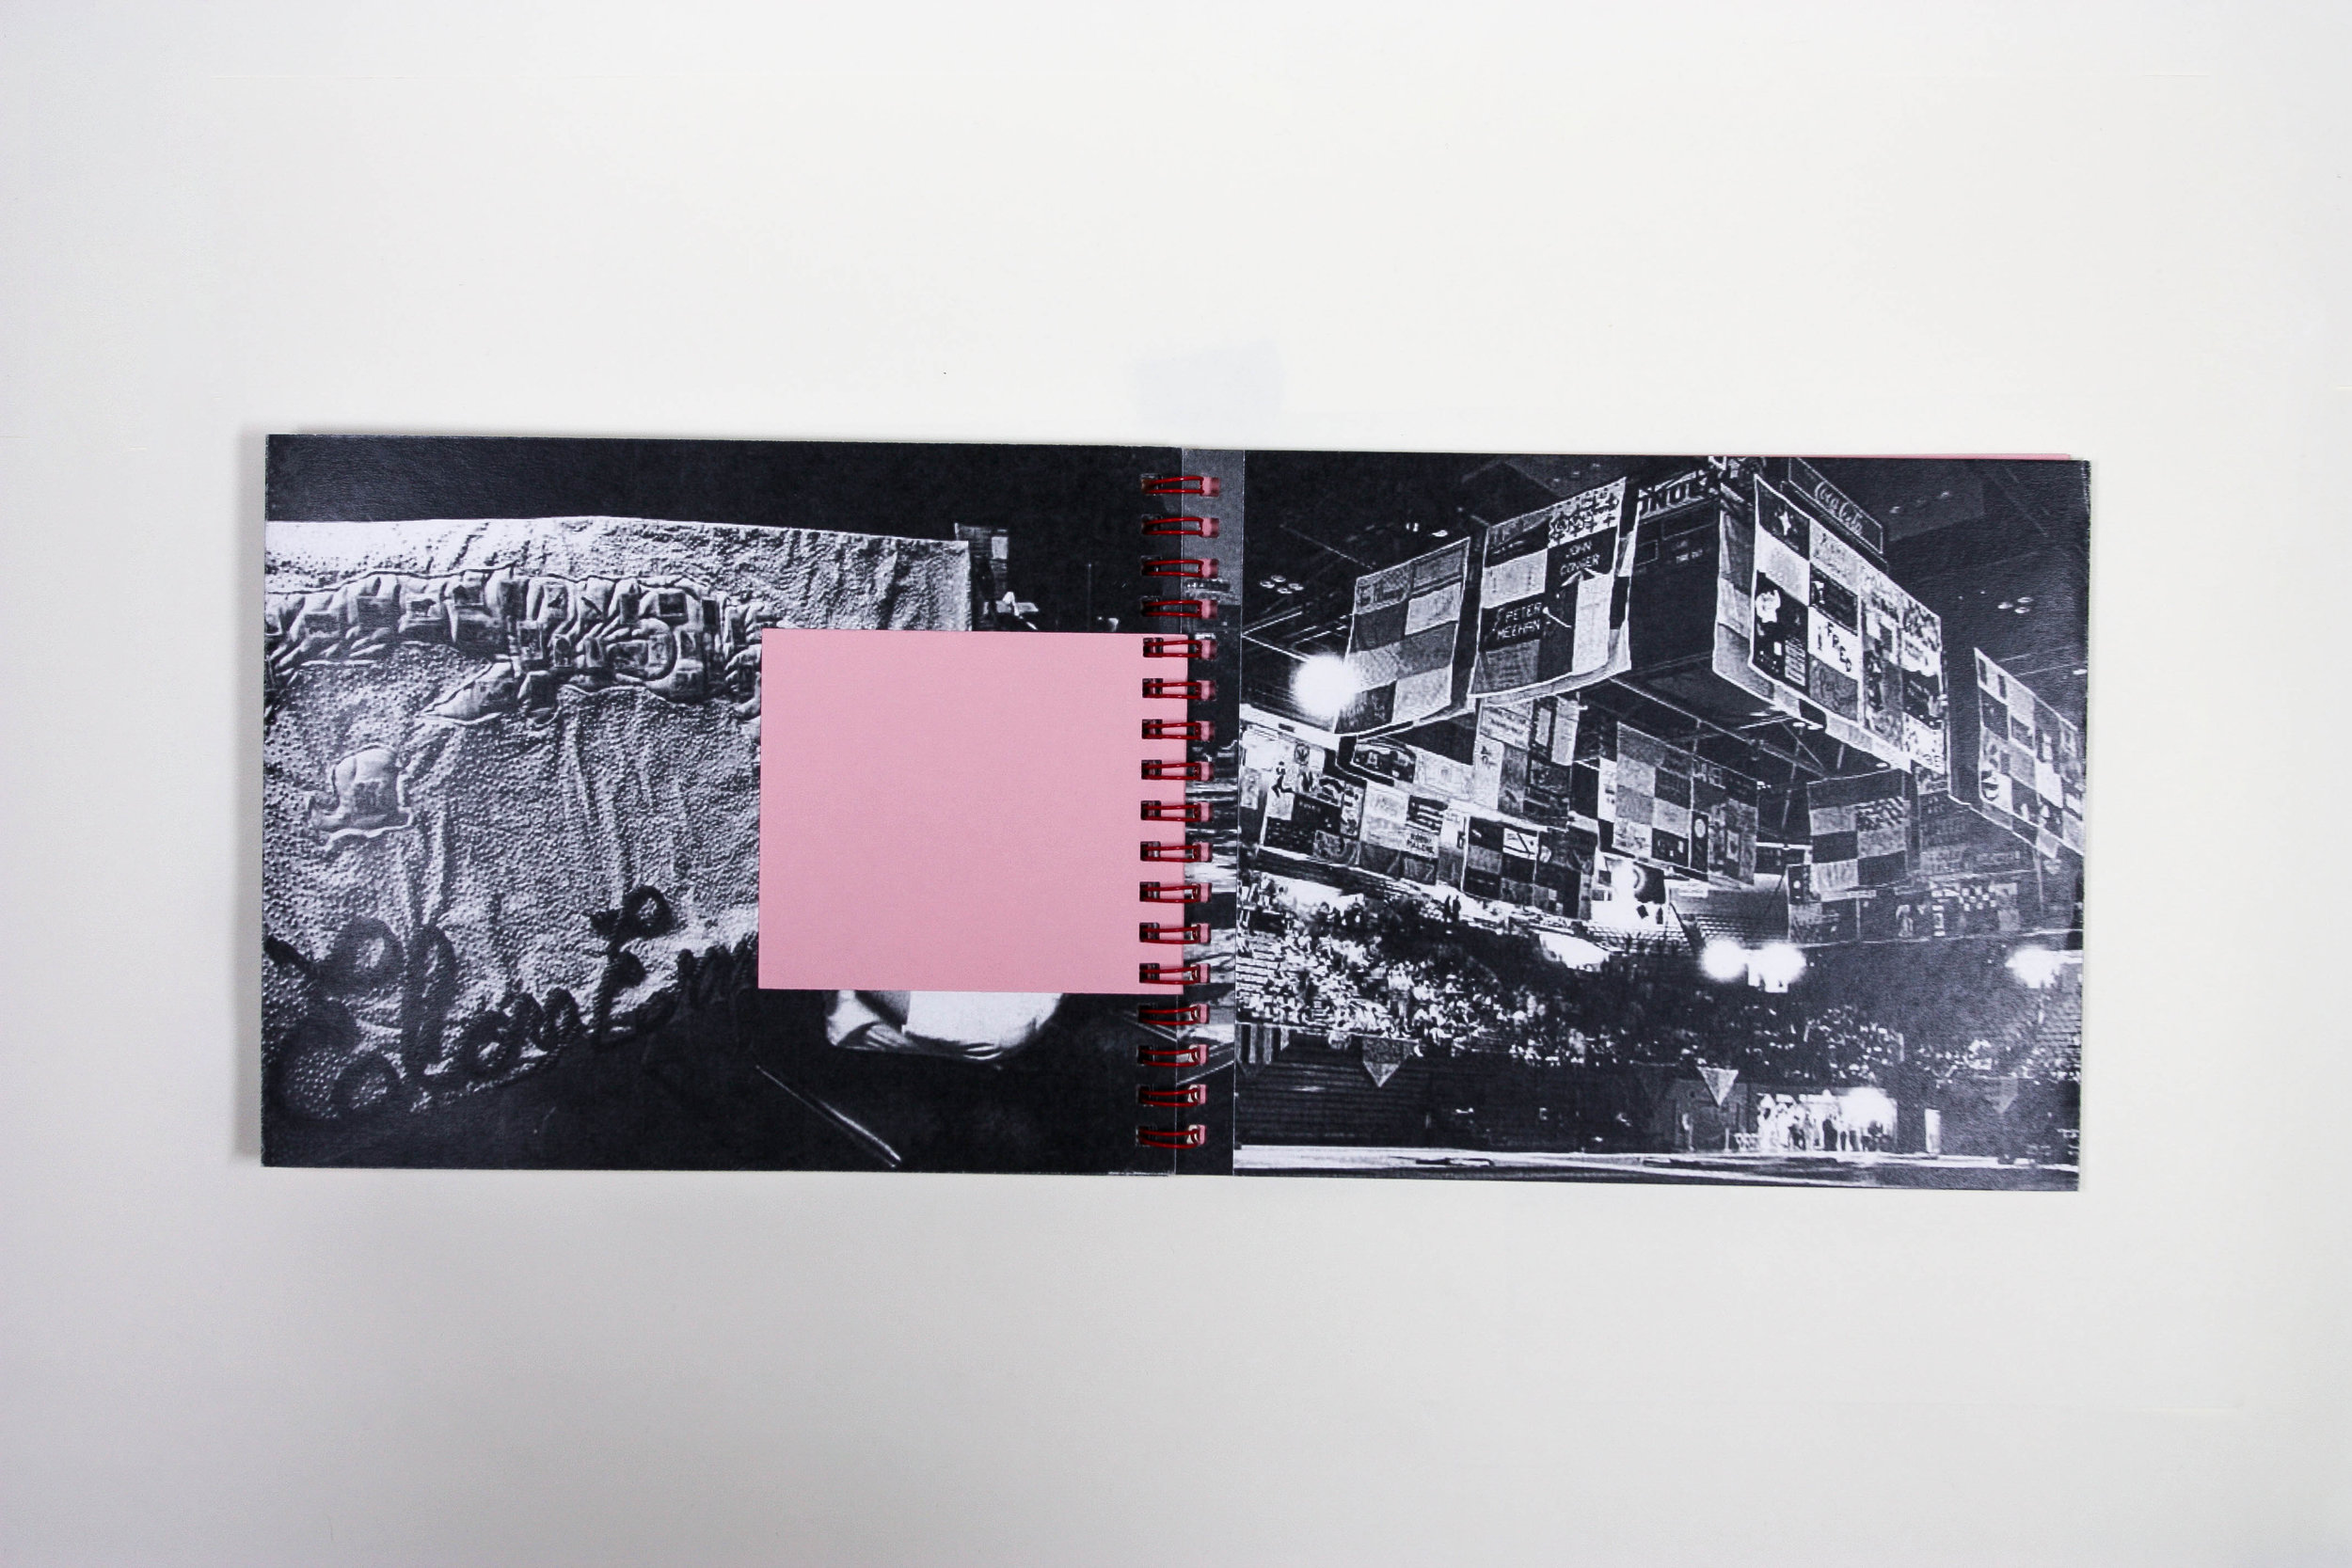 estory-bookimages-23.jpg